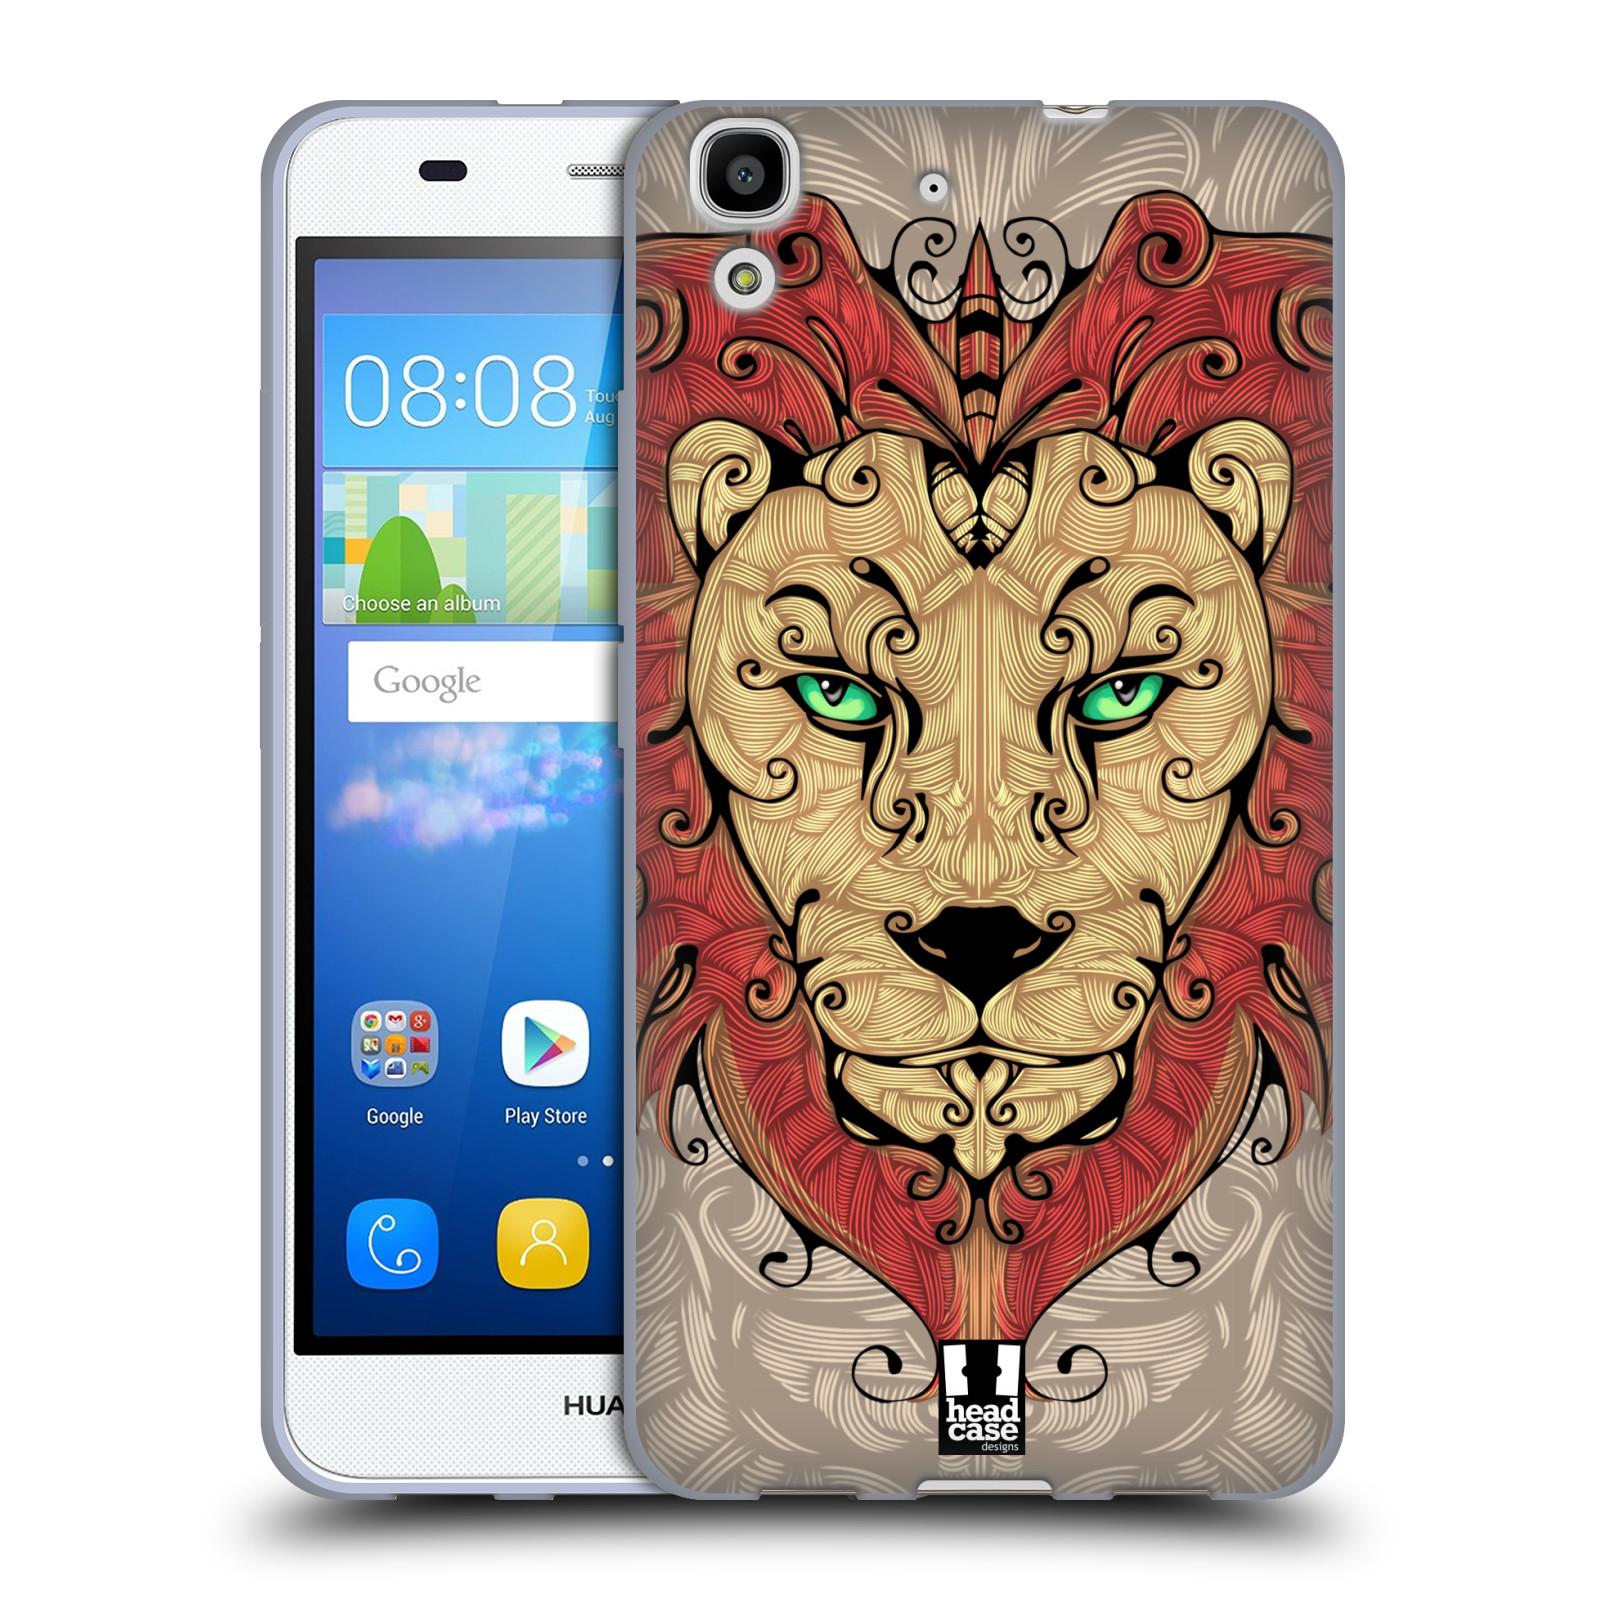 HEAD CASE silikonový obal na mobil HUAWEI Y6 vzor kudrlinky zvíře lev